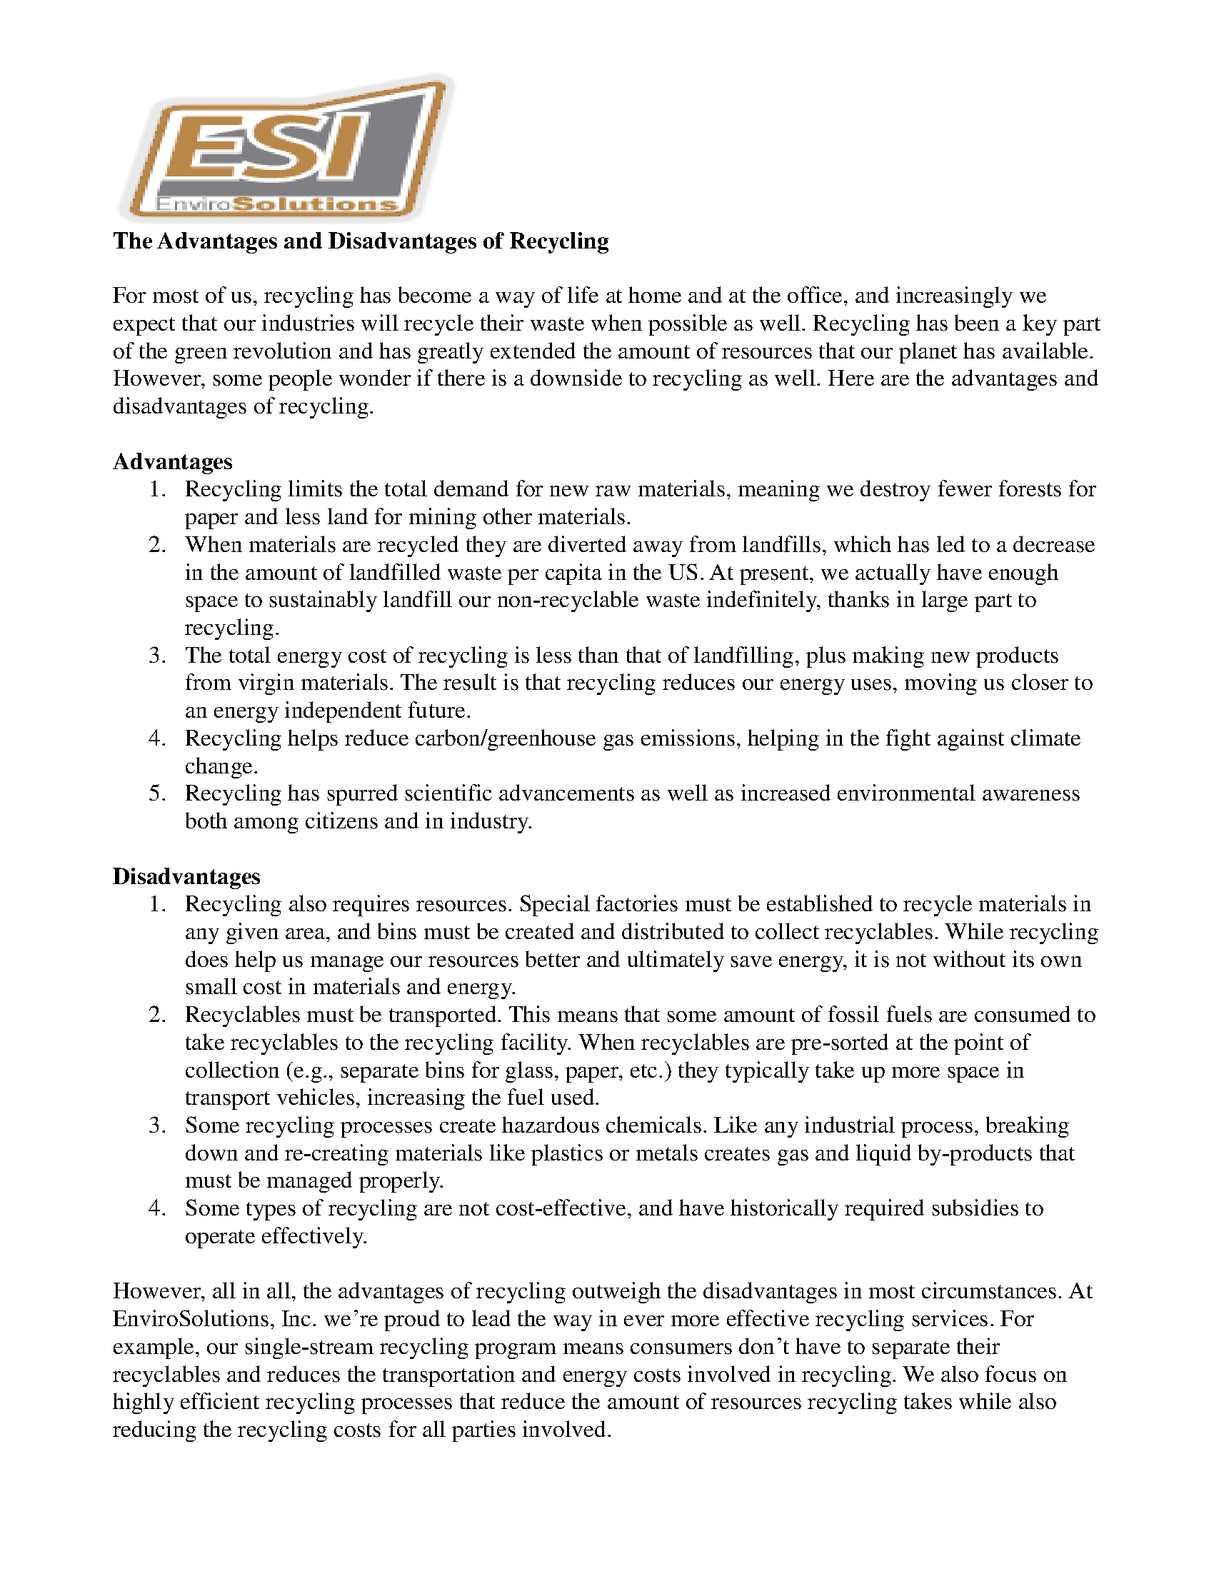 Response to literature essay high school